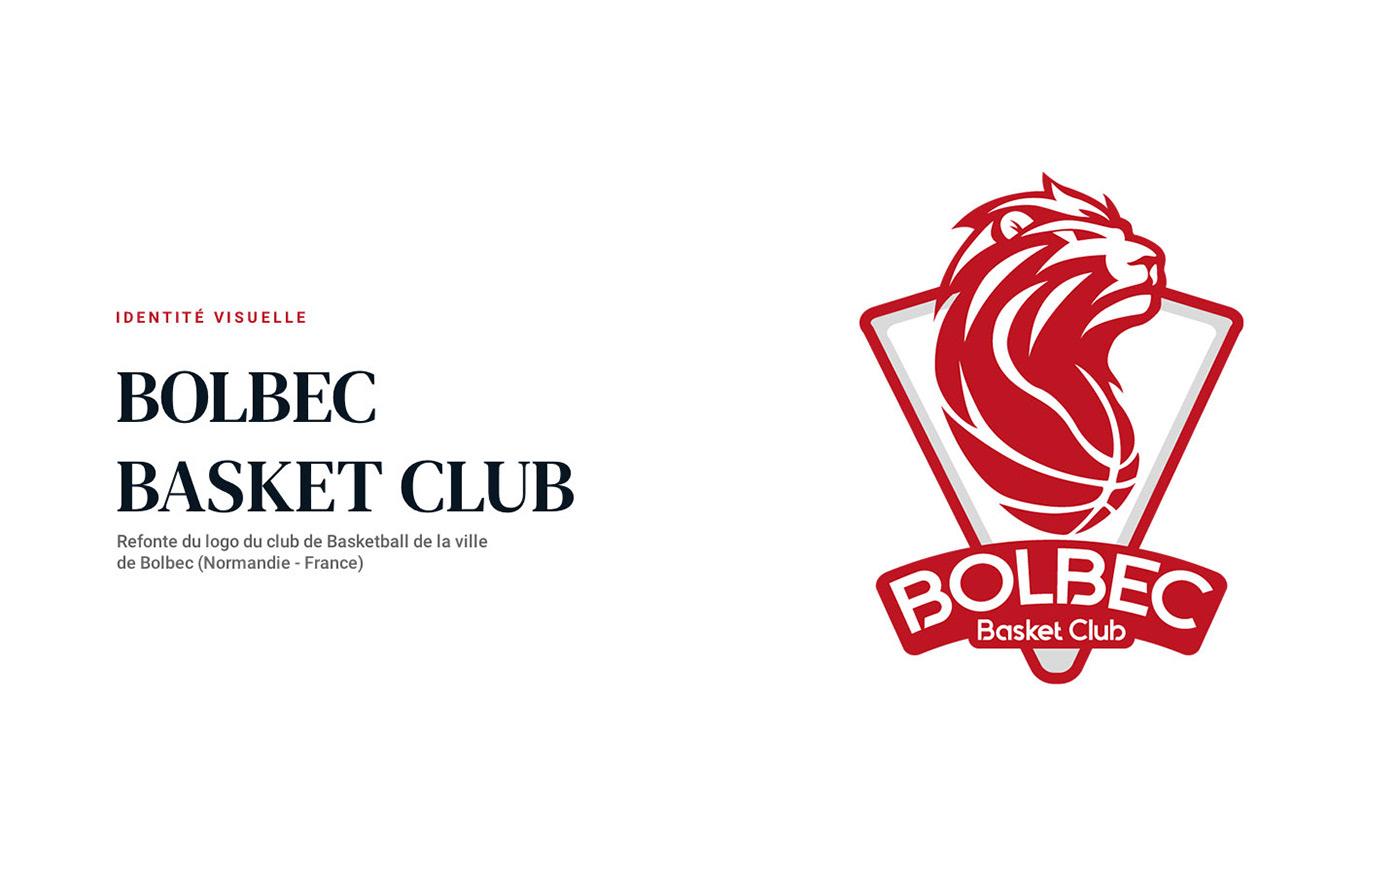 basket club basketball identité visuelle logo basket club Logotype sport